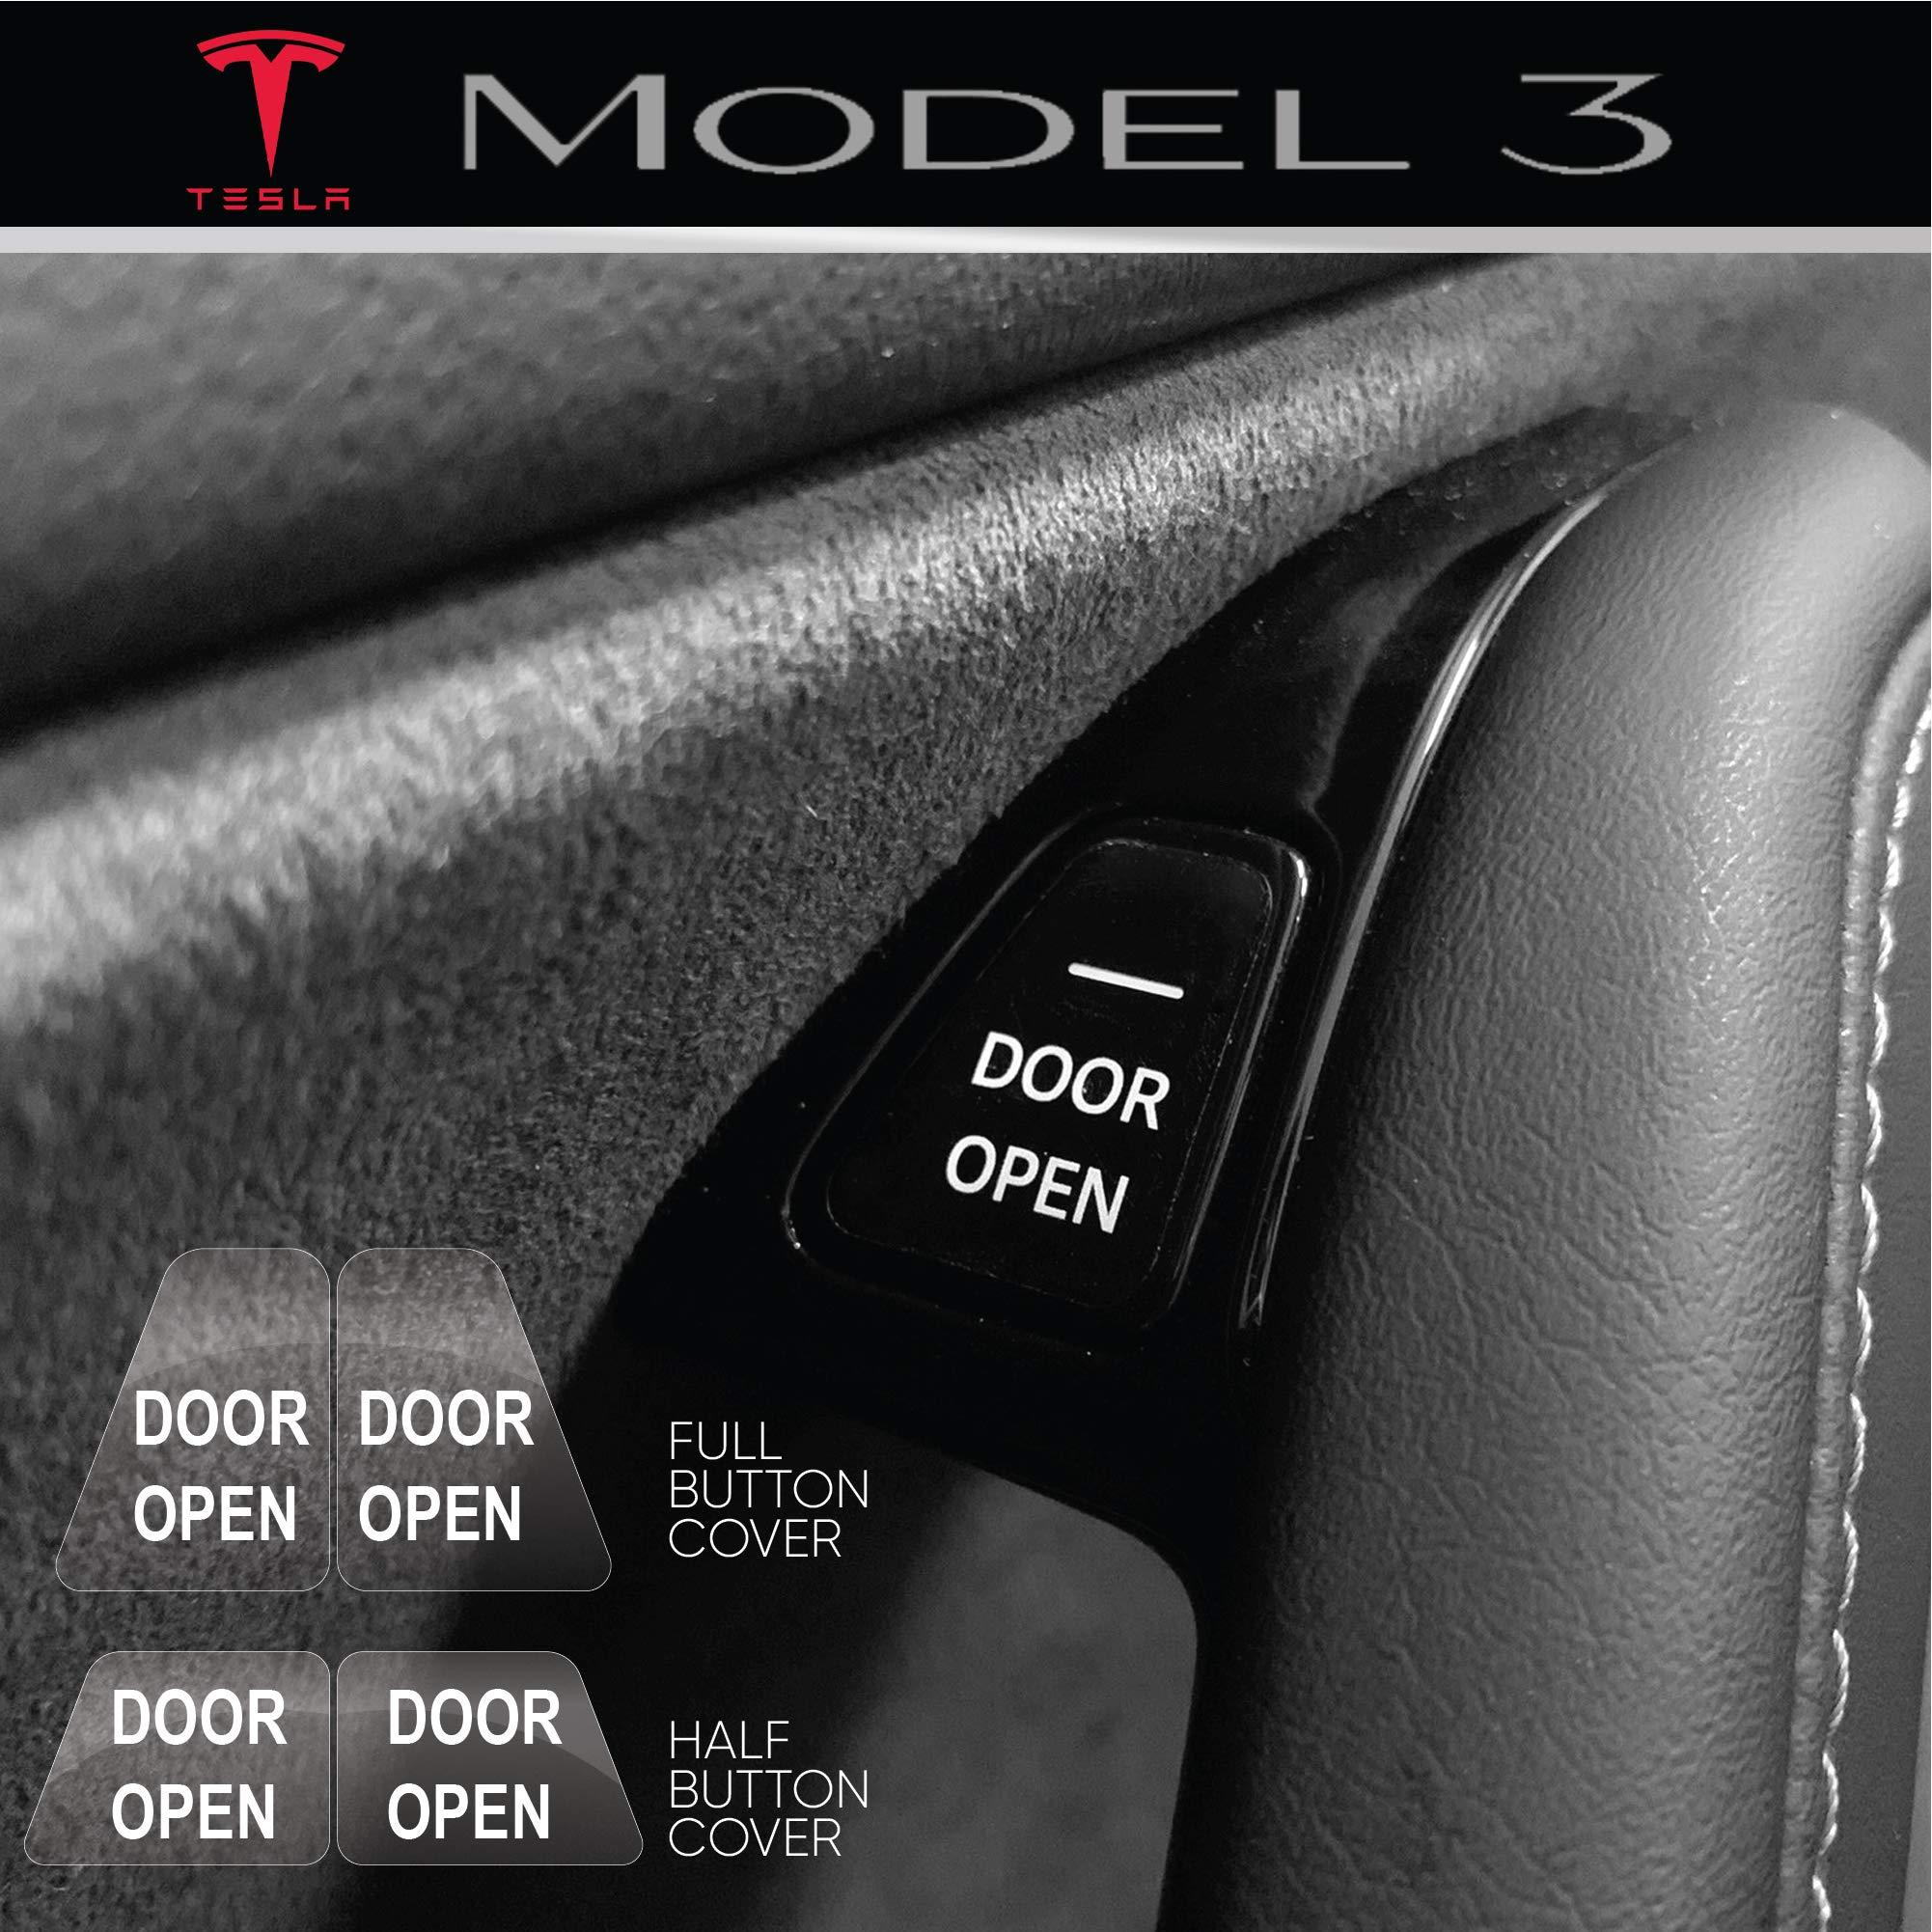 Tesla 2 Logo Car Tag Diamond Etched on Black Aluminum License Plate